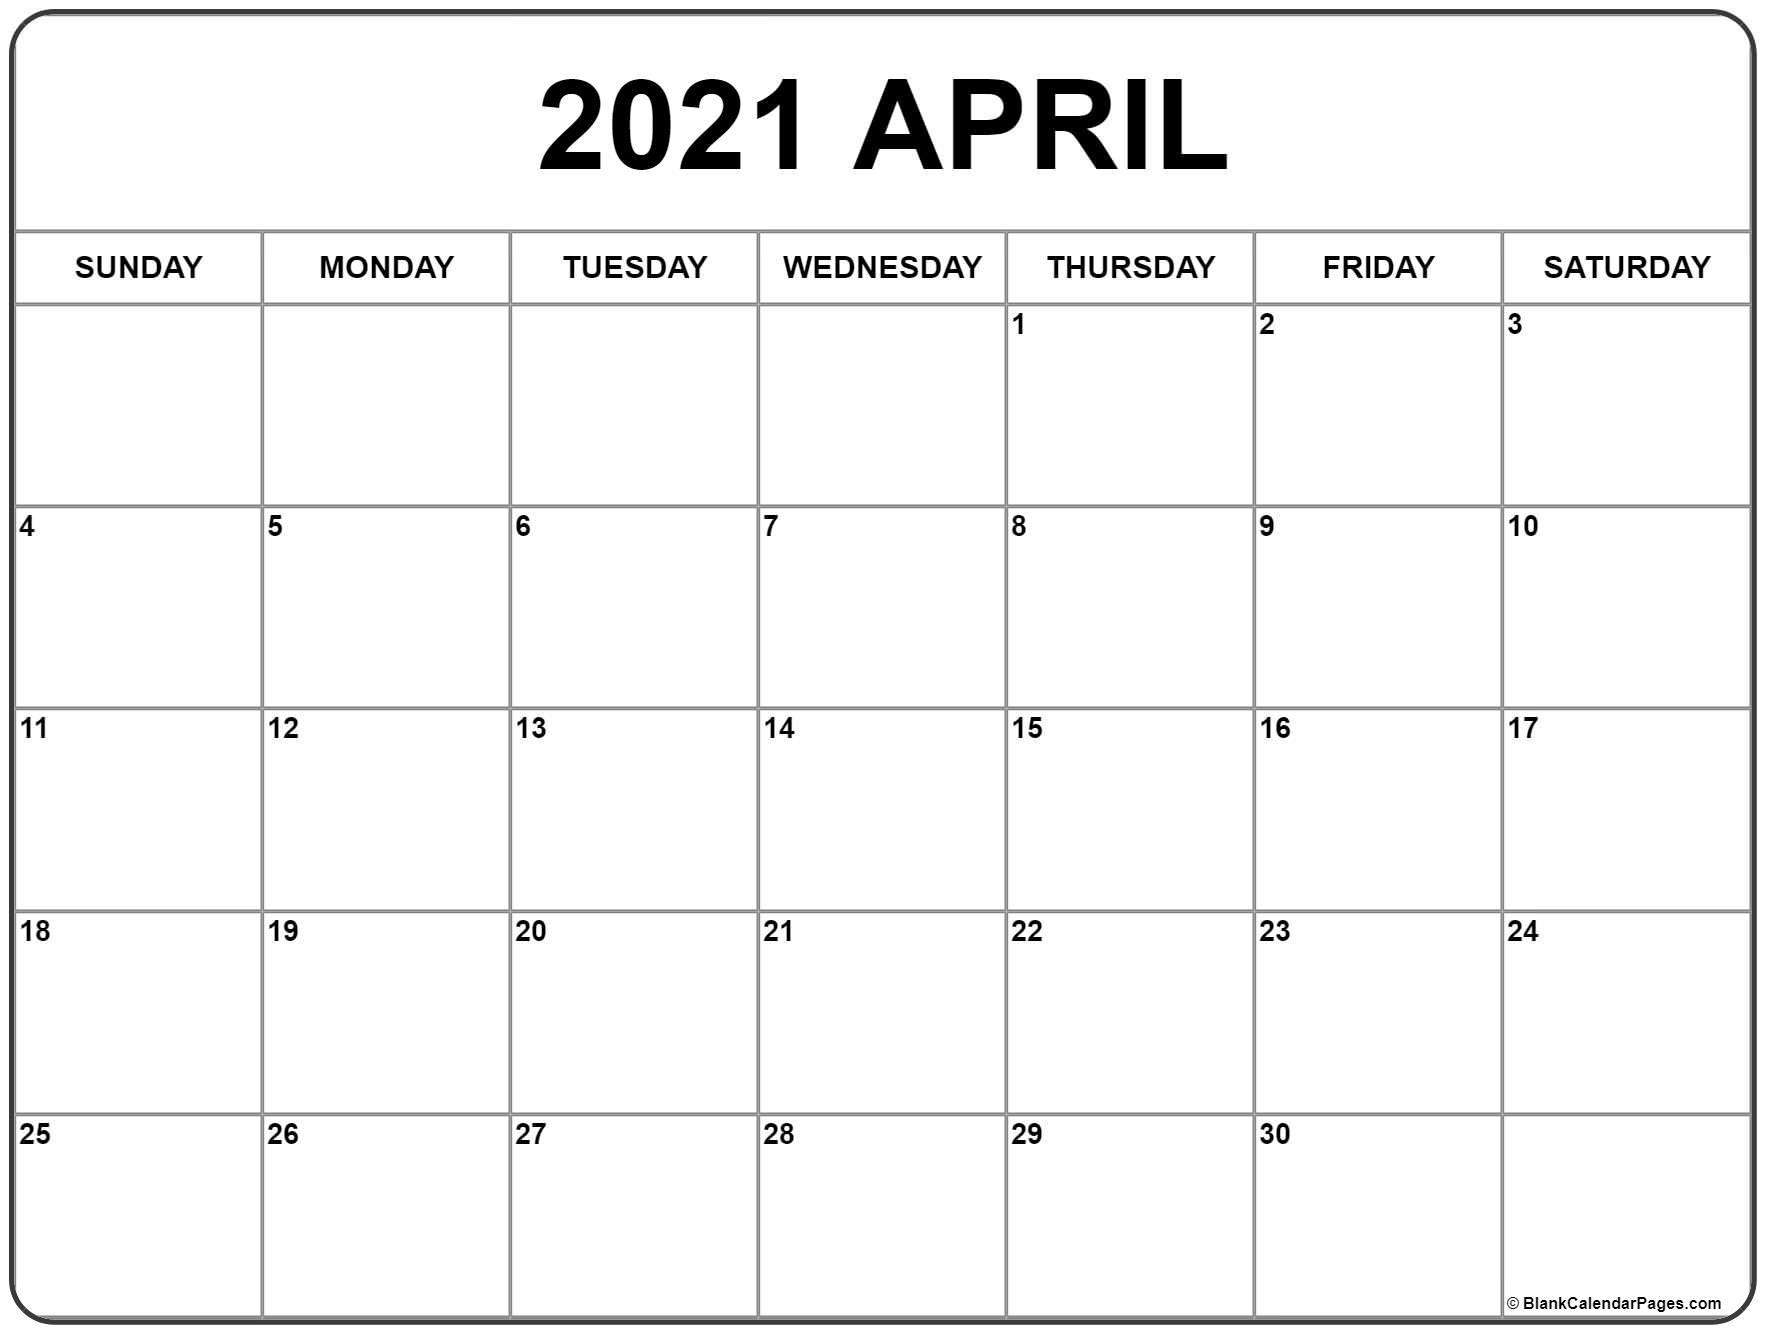 April 2021 Calendar | Free Printable Monthly Calendars